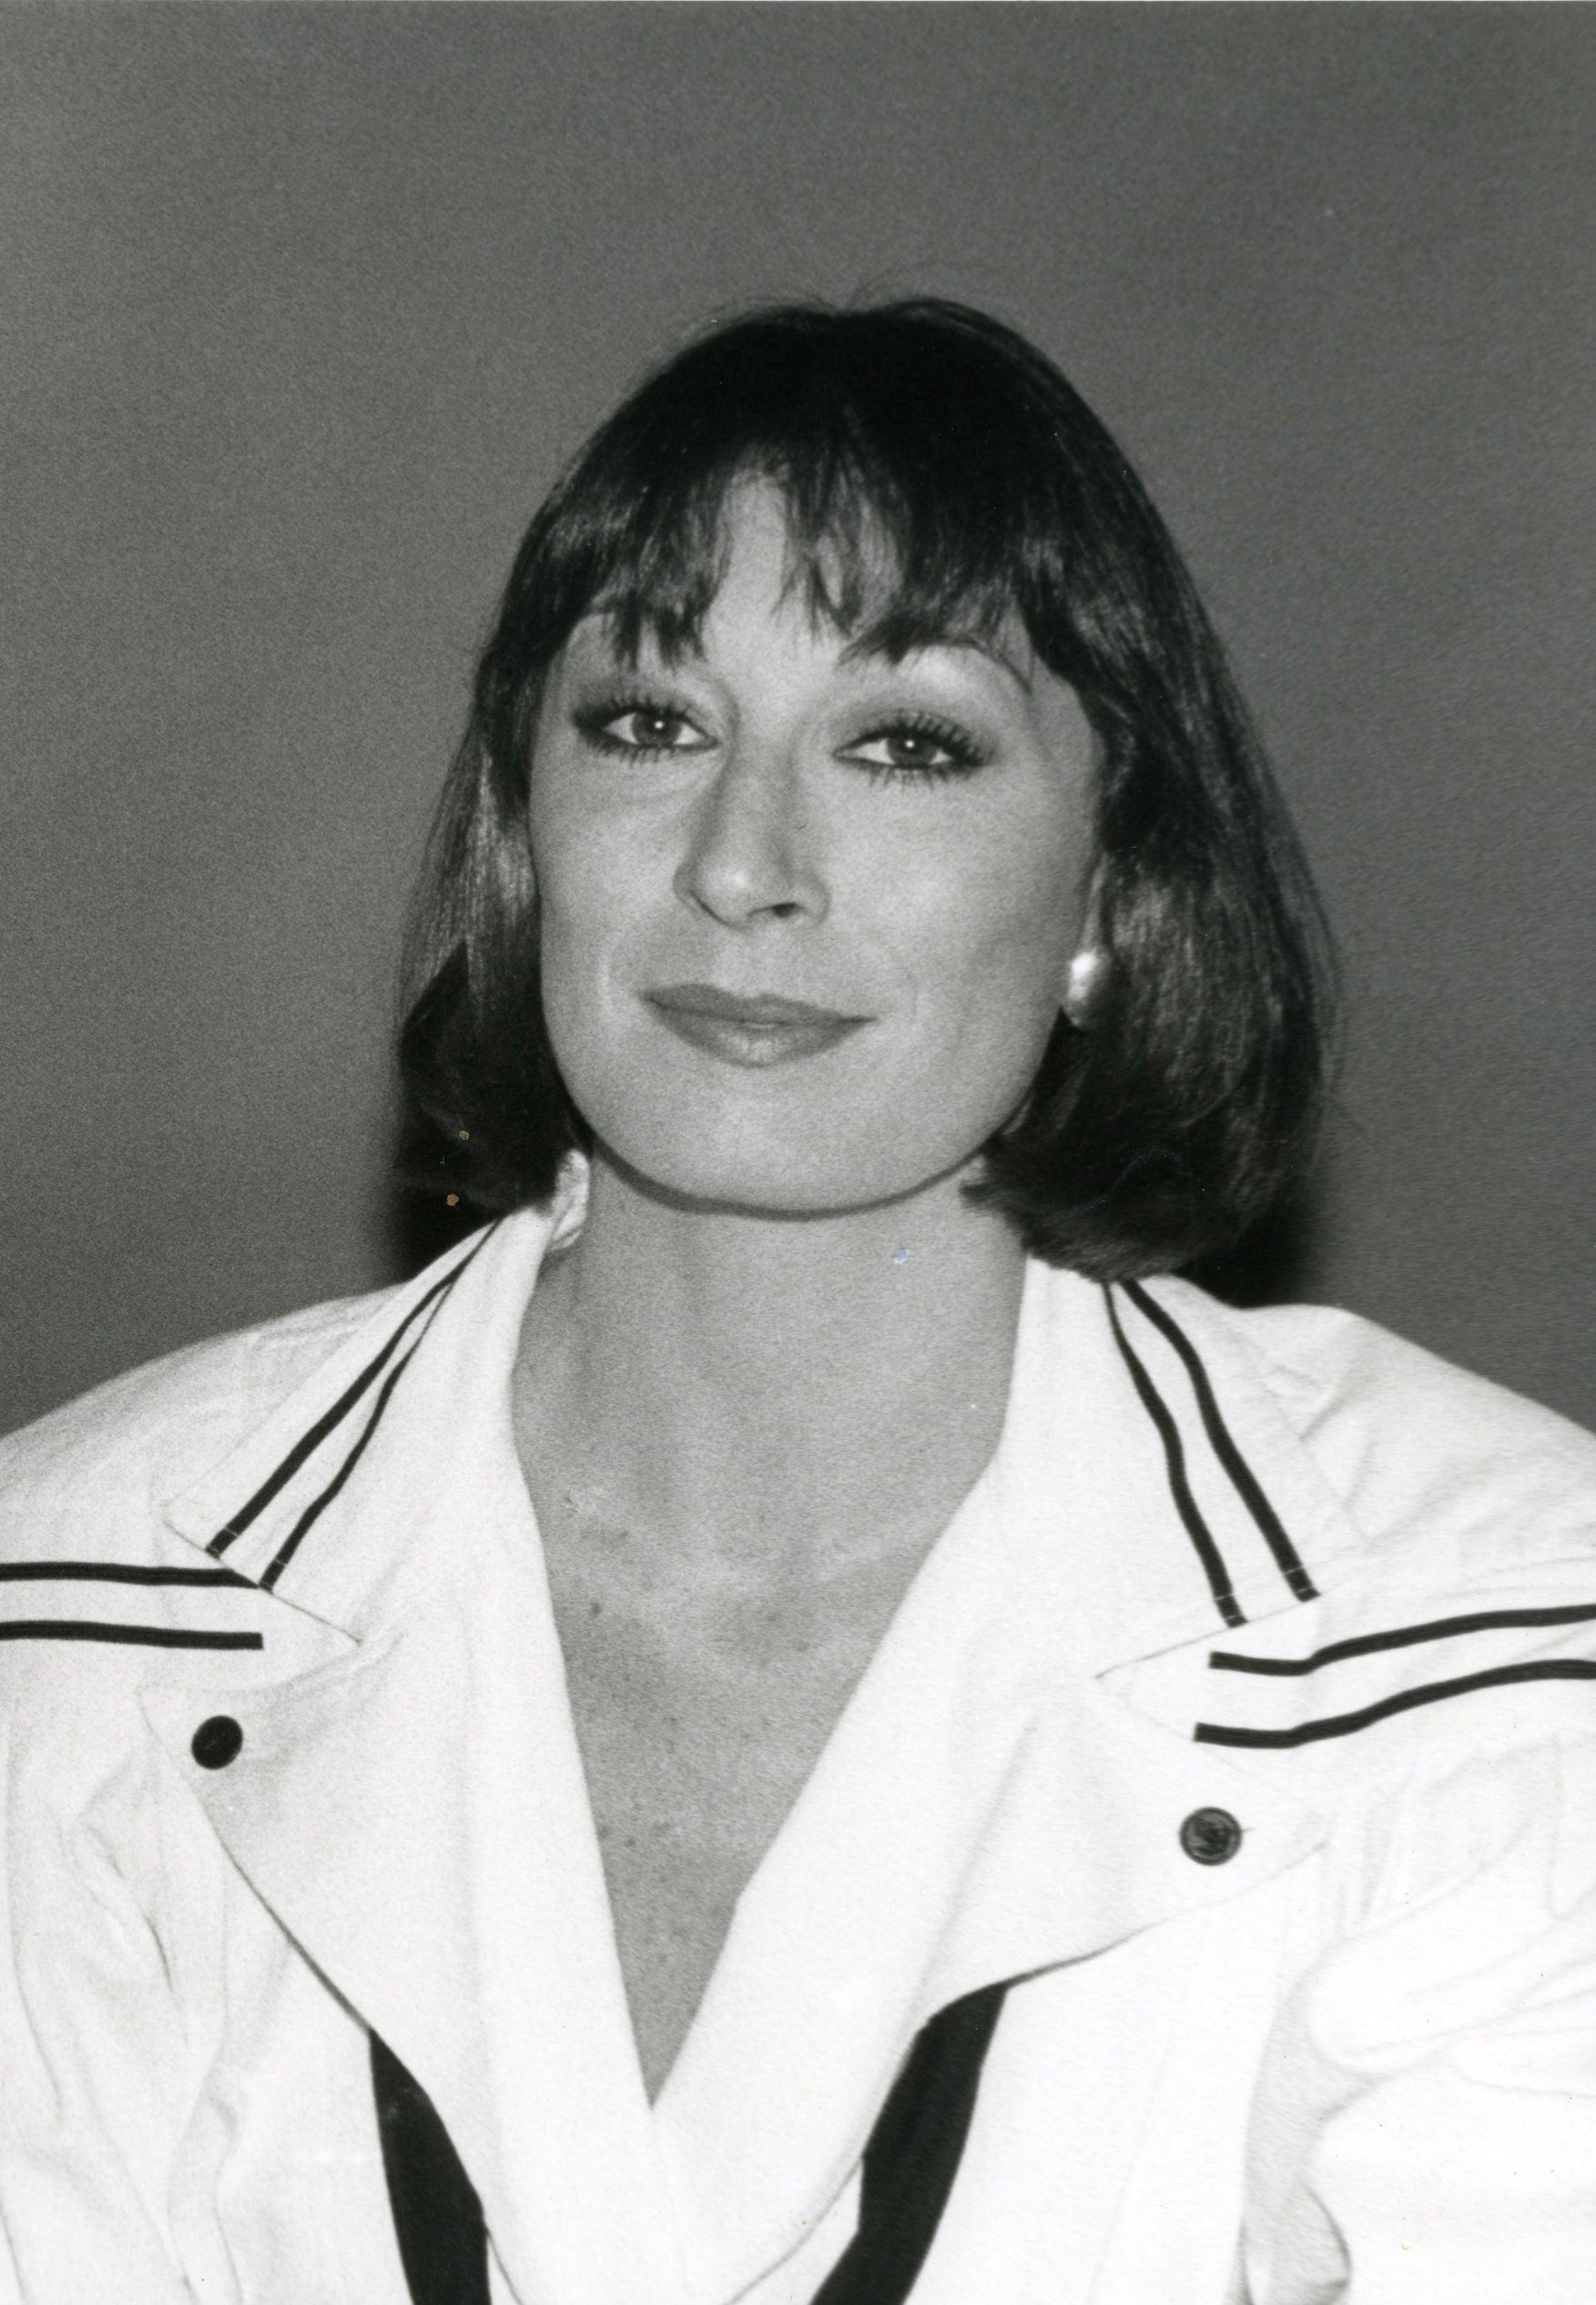 Actress and director Anjeica Huston, Golden Globe winner